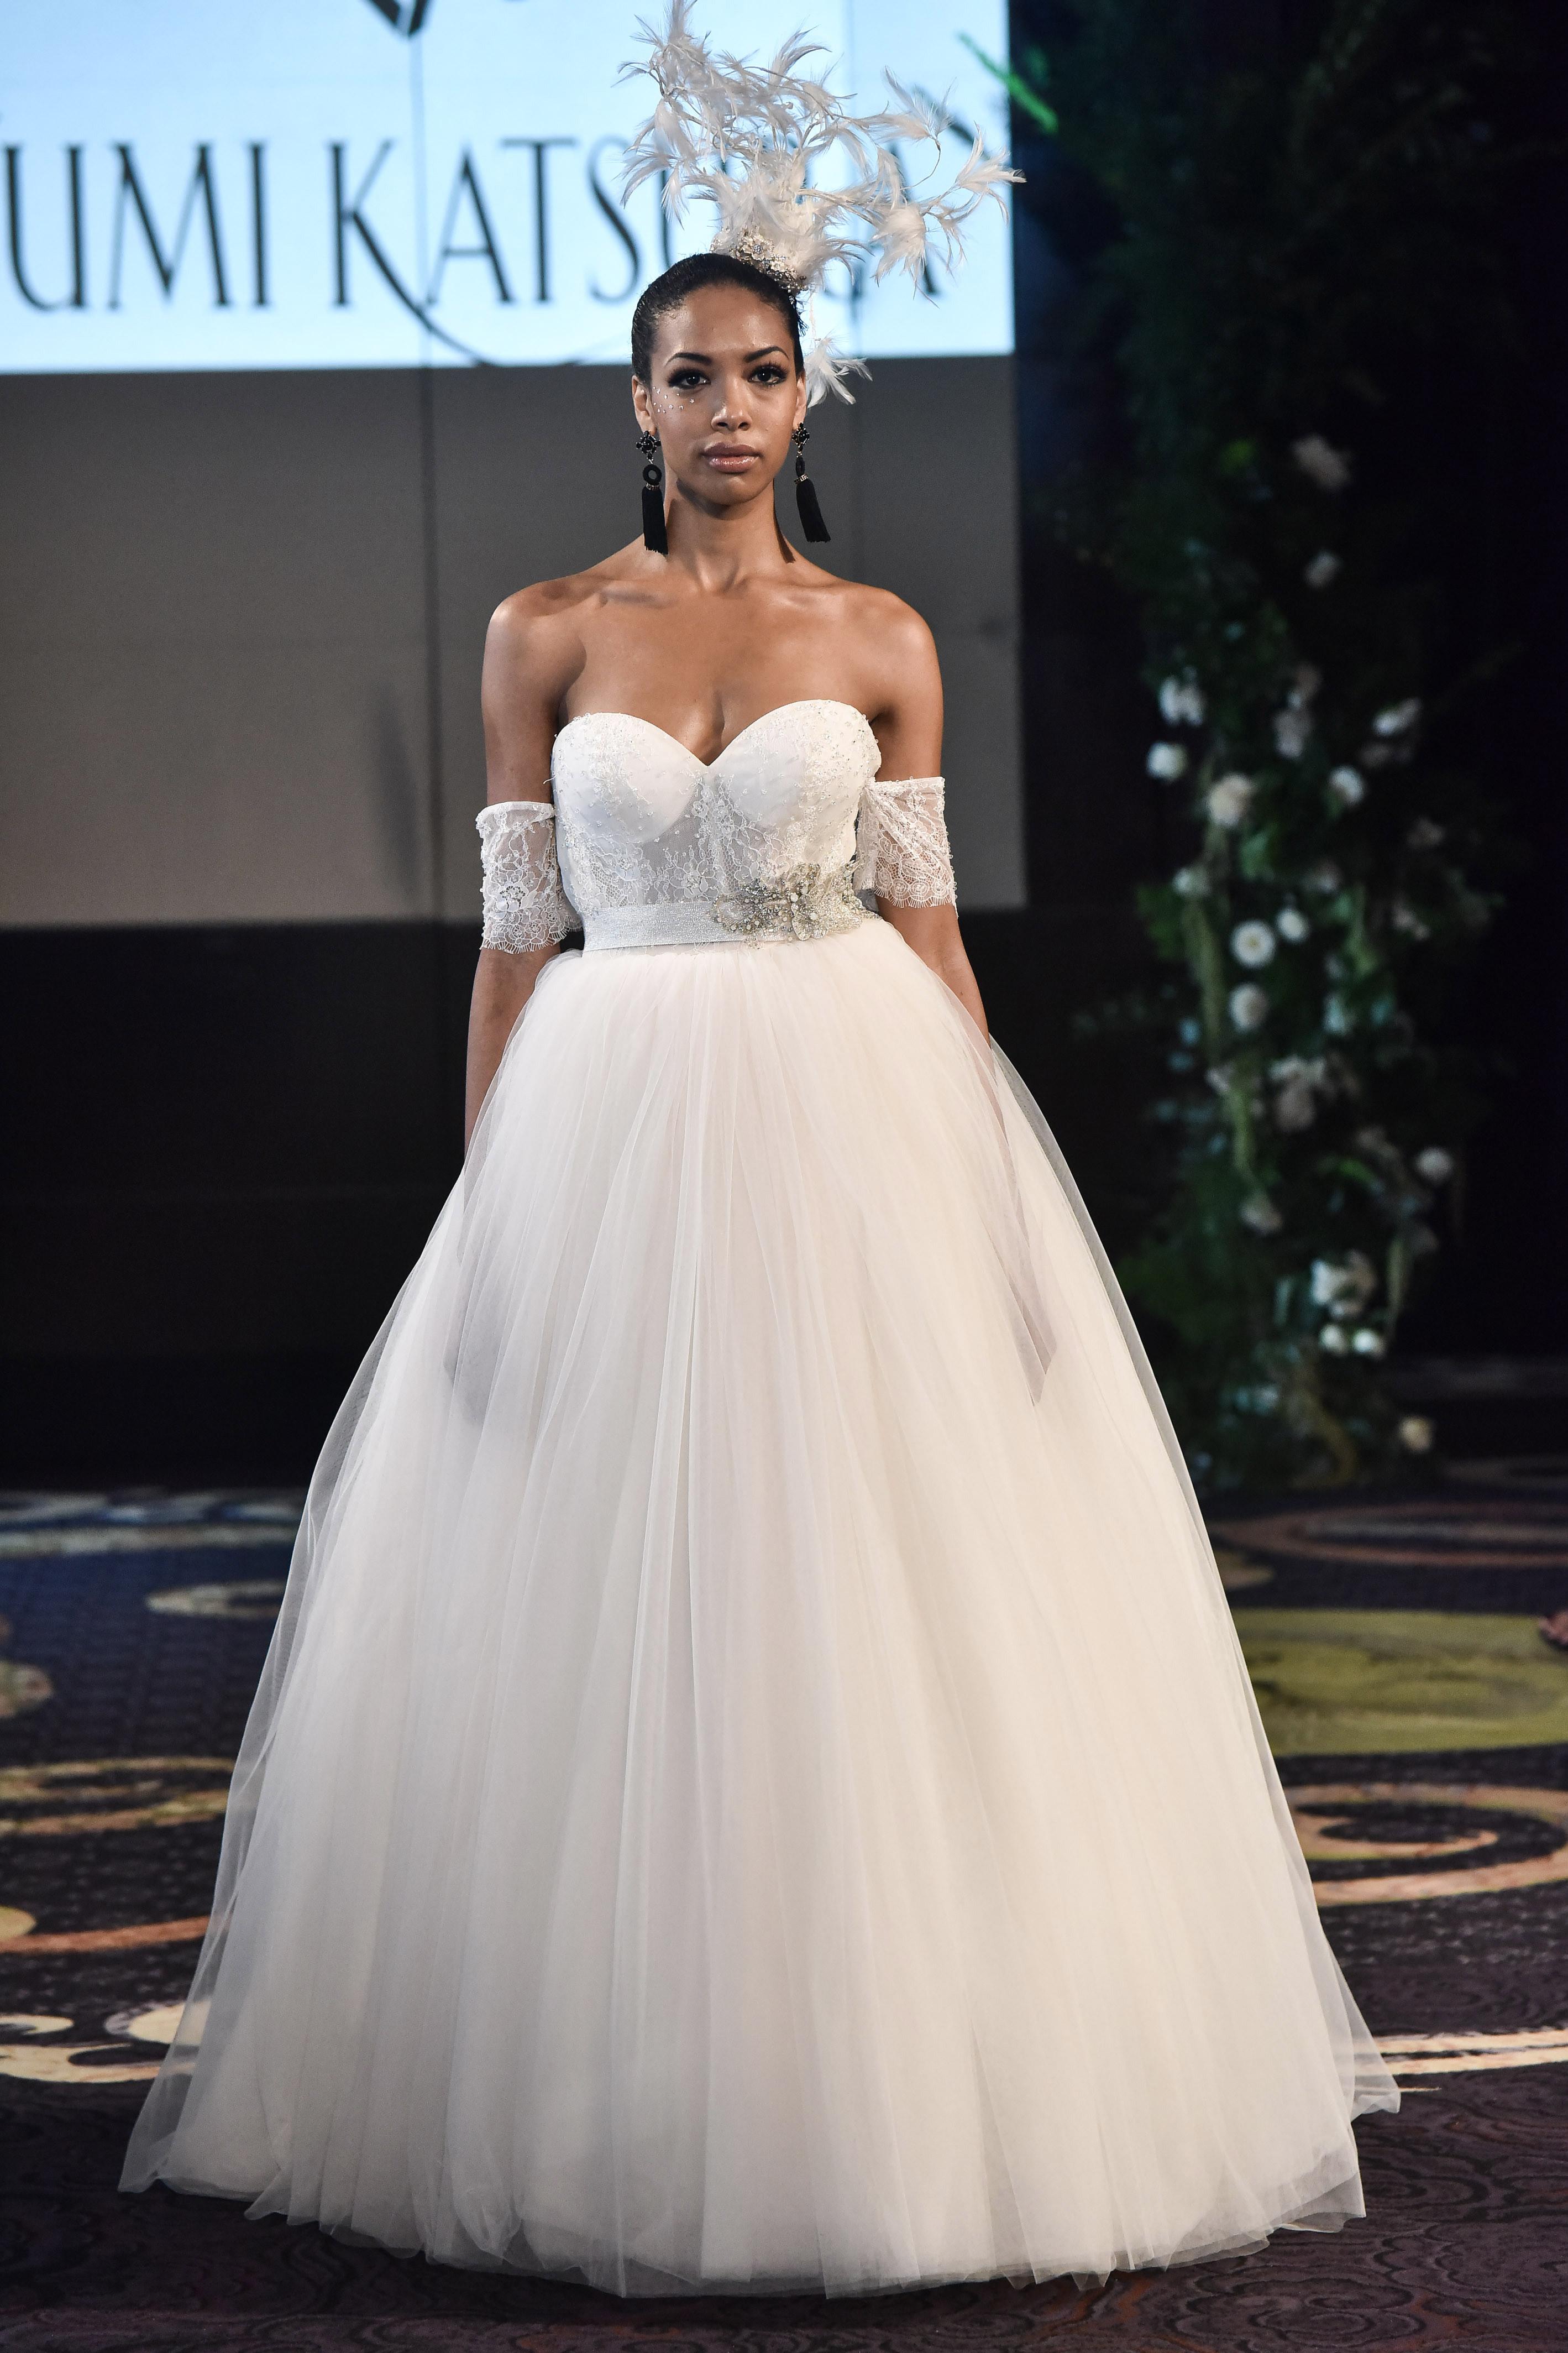 yumi katsura fall 2018 sweetheart ballgown wedding dress